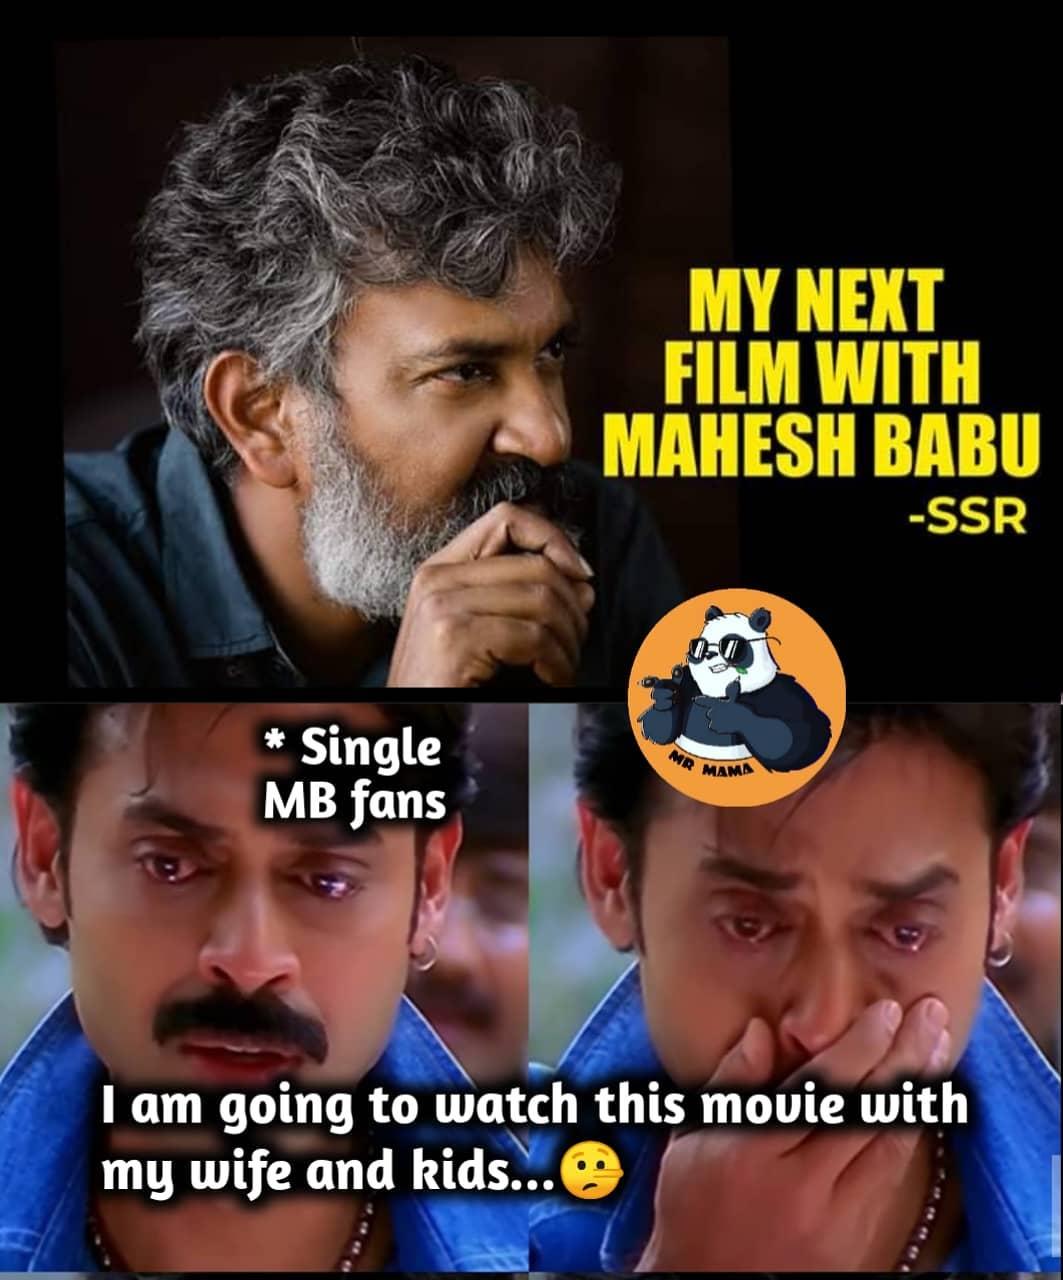 13. Mahesh Babu And Ss Rajamouli Memes